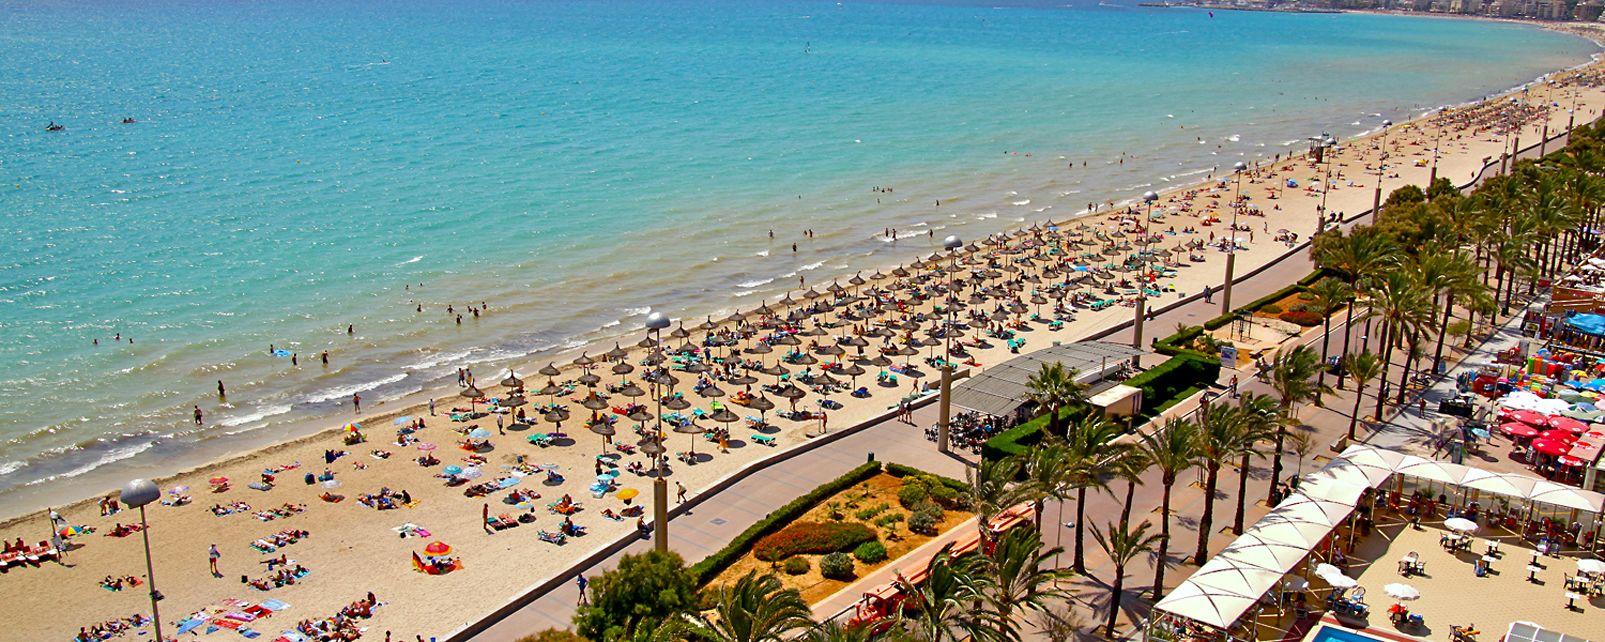 Mallorca Playa De Palma Hotel Cristina